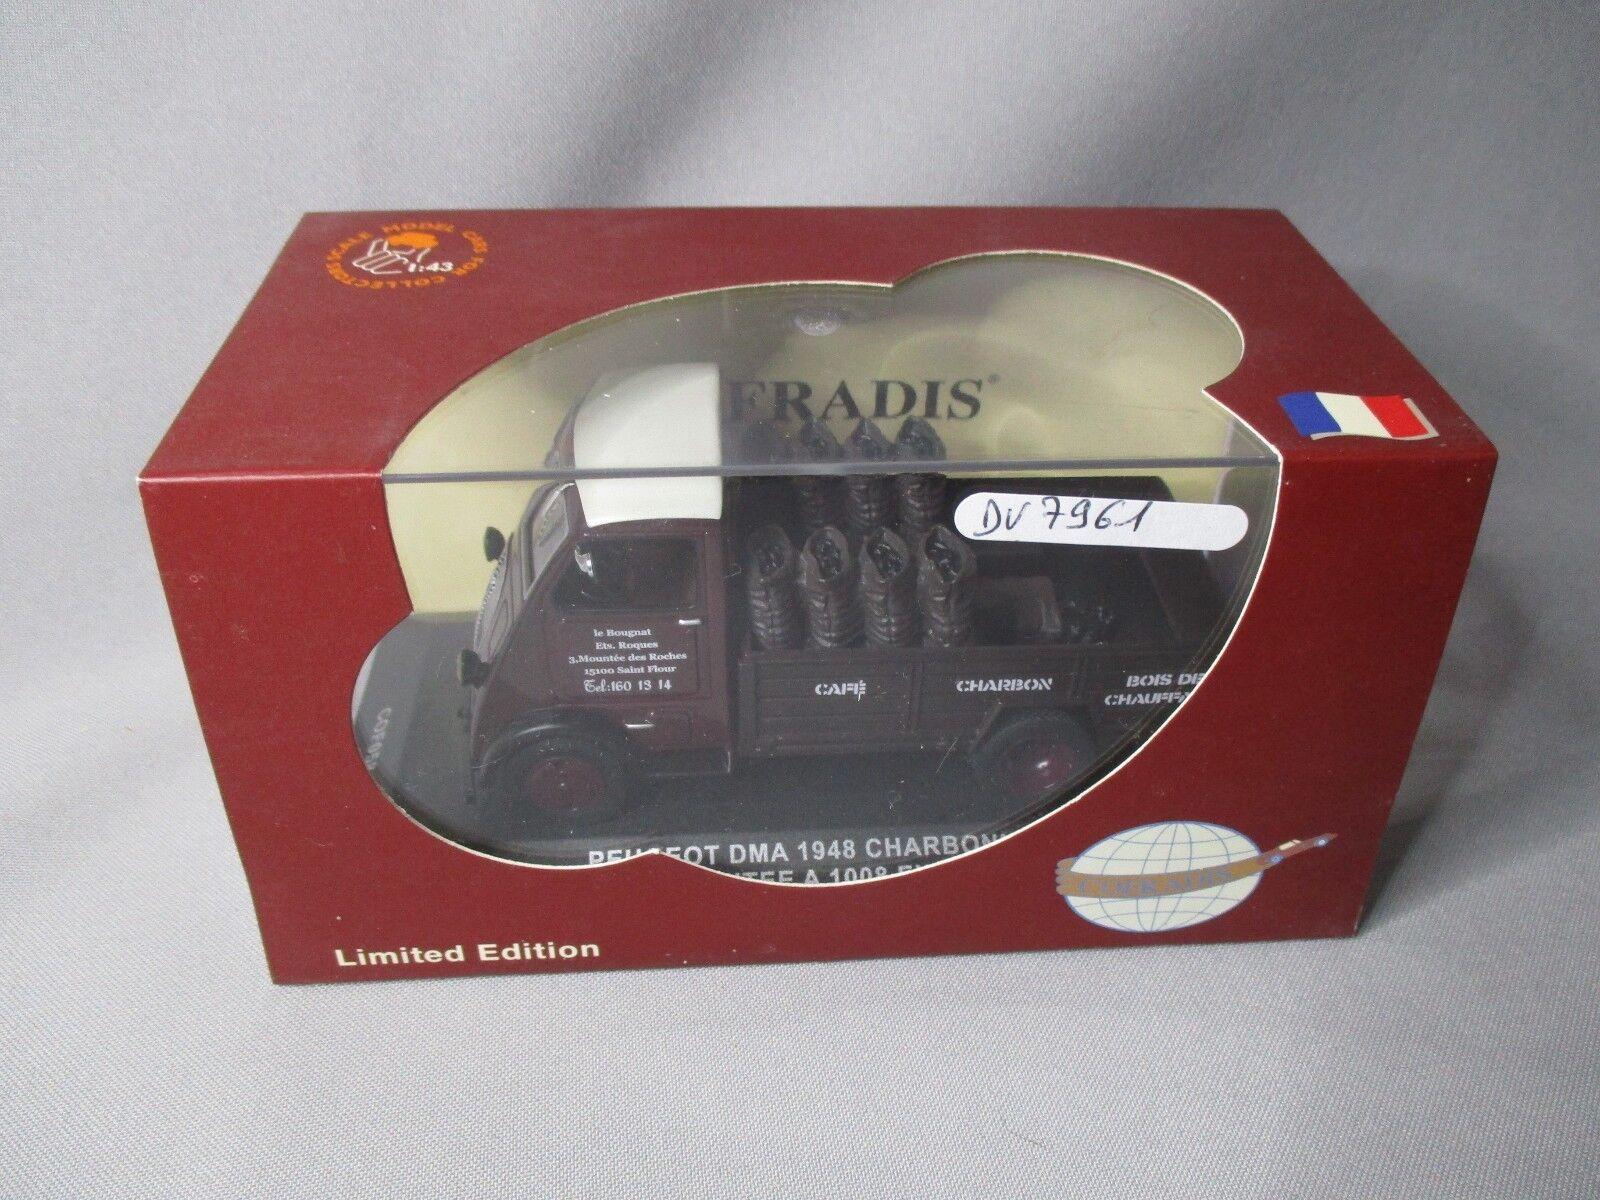 suministramos lo mejor DV7961 COFRADIS PEUGEOT DMA 1948 CHARBONNIER 1 43 Ref Ref Ref COF058 Ed Lim 1008ex NB  increíbles descuentos